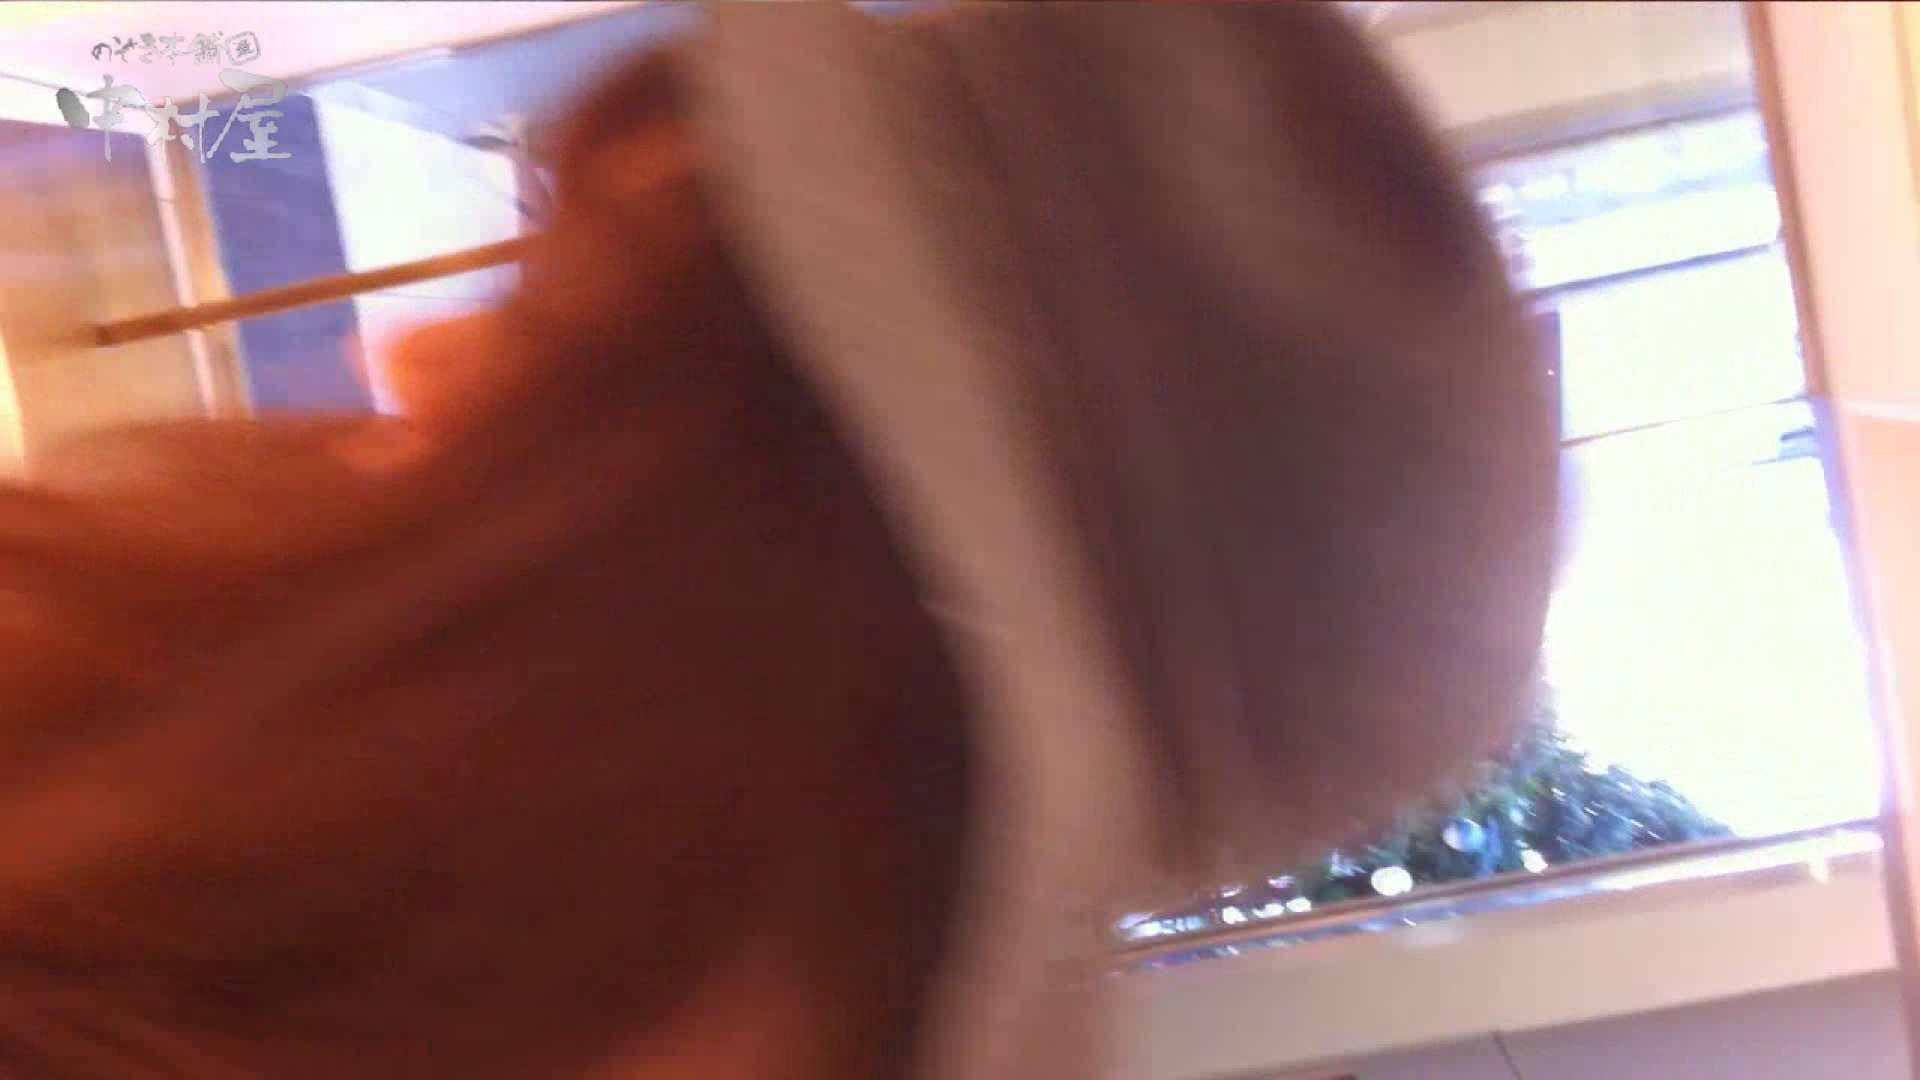 vol.74 美人アパレル胸チラ&パンチラ ブカブカセーターあざっす! 胸チラ AV無料 93PIX 7